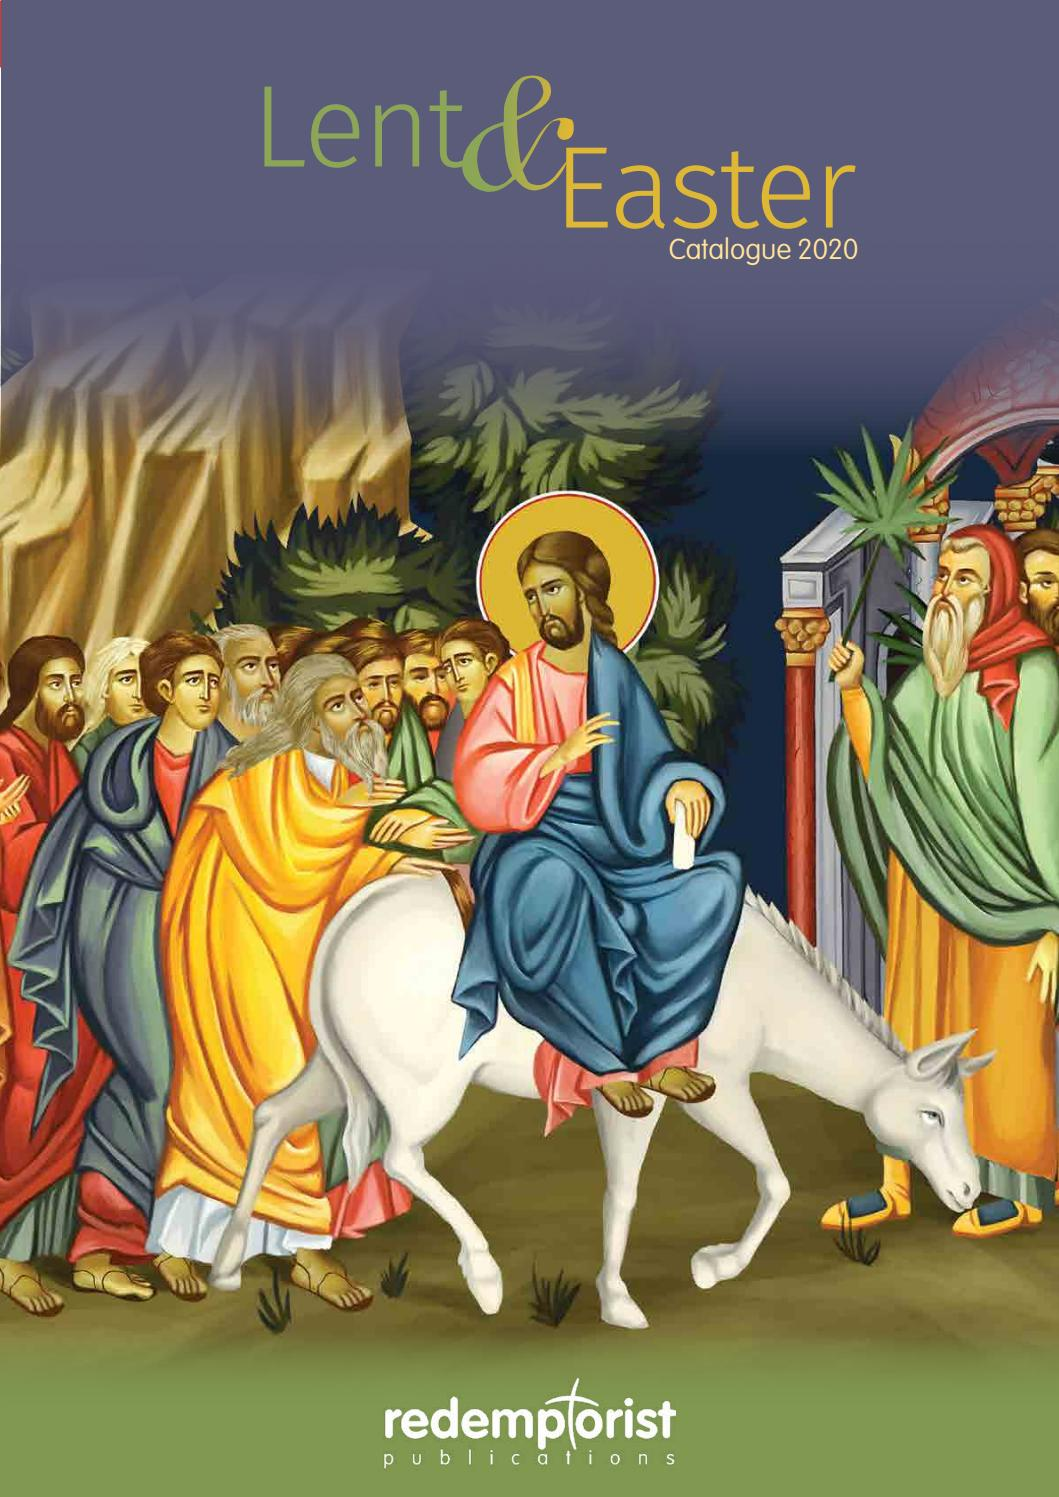 9 Pc Easter Holy Week Religious Rugged Cross Tabletop Scene Resin